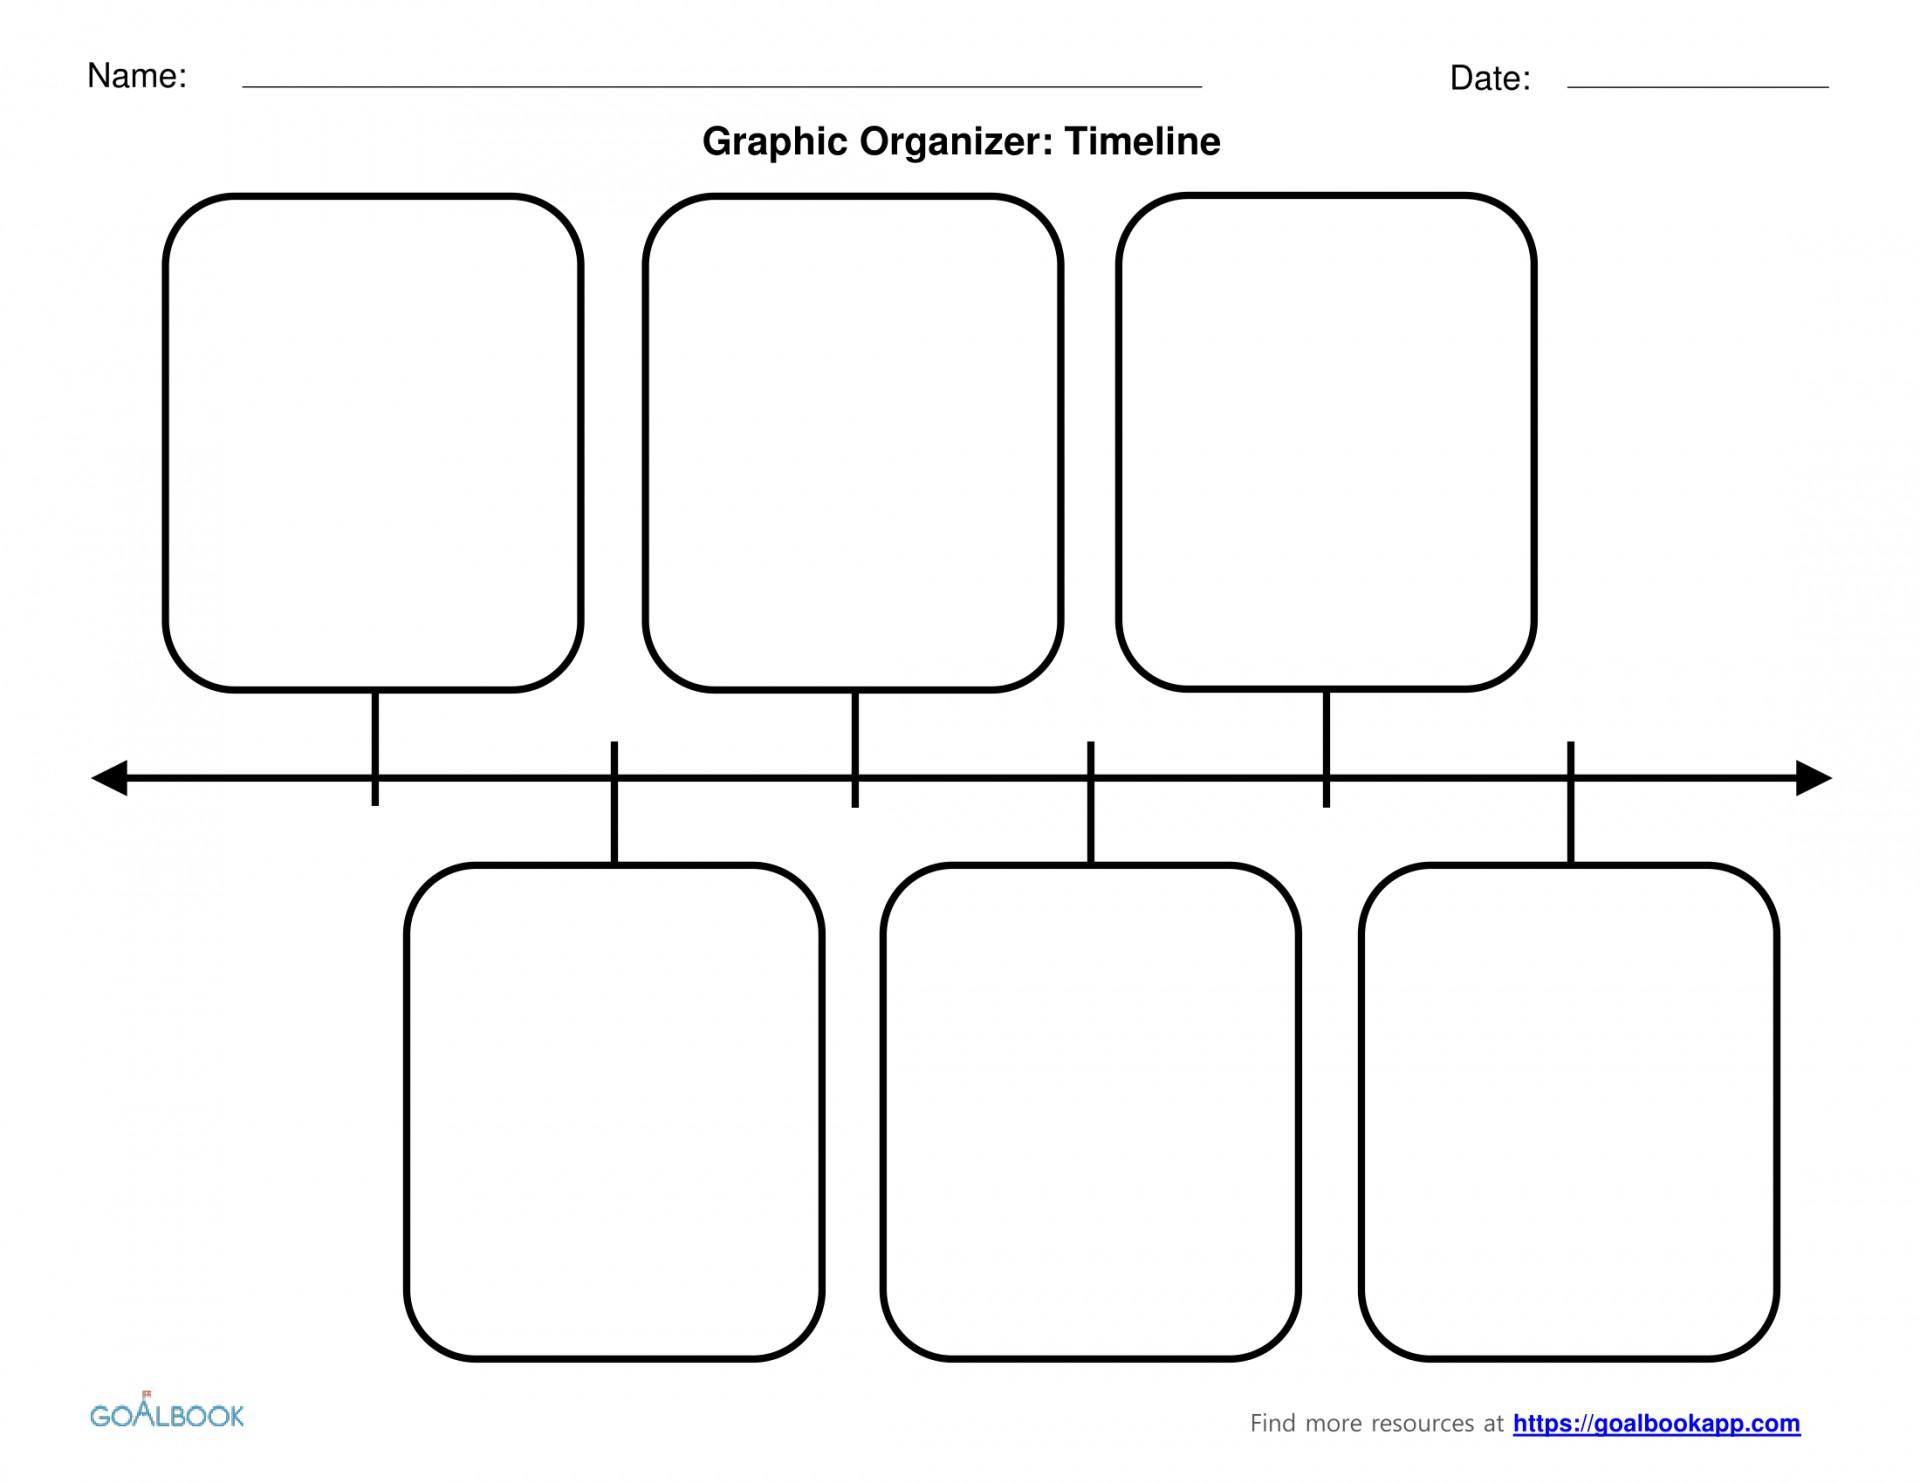 018 03 Timeline Blank Essay Example Five Paragraph Graphic Wonderful Organizer 5 Middle School Pdf Organizer-hamburger 1920